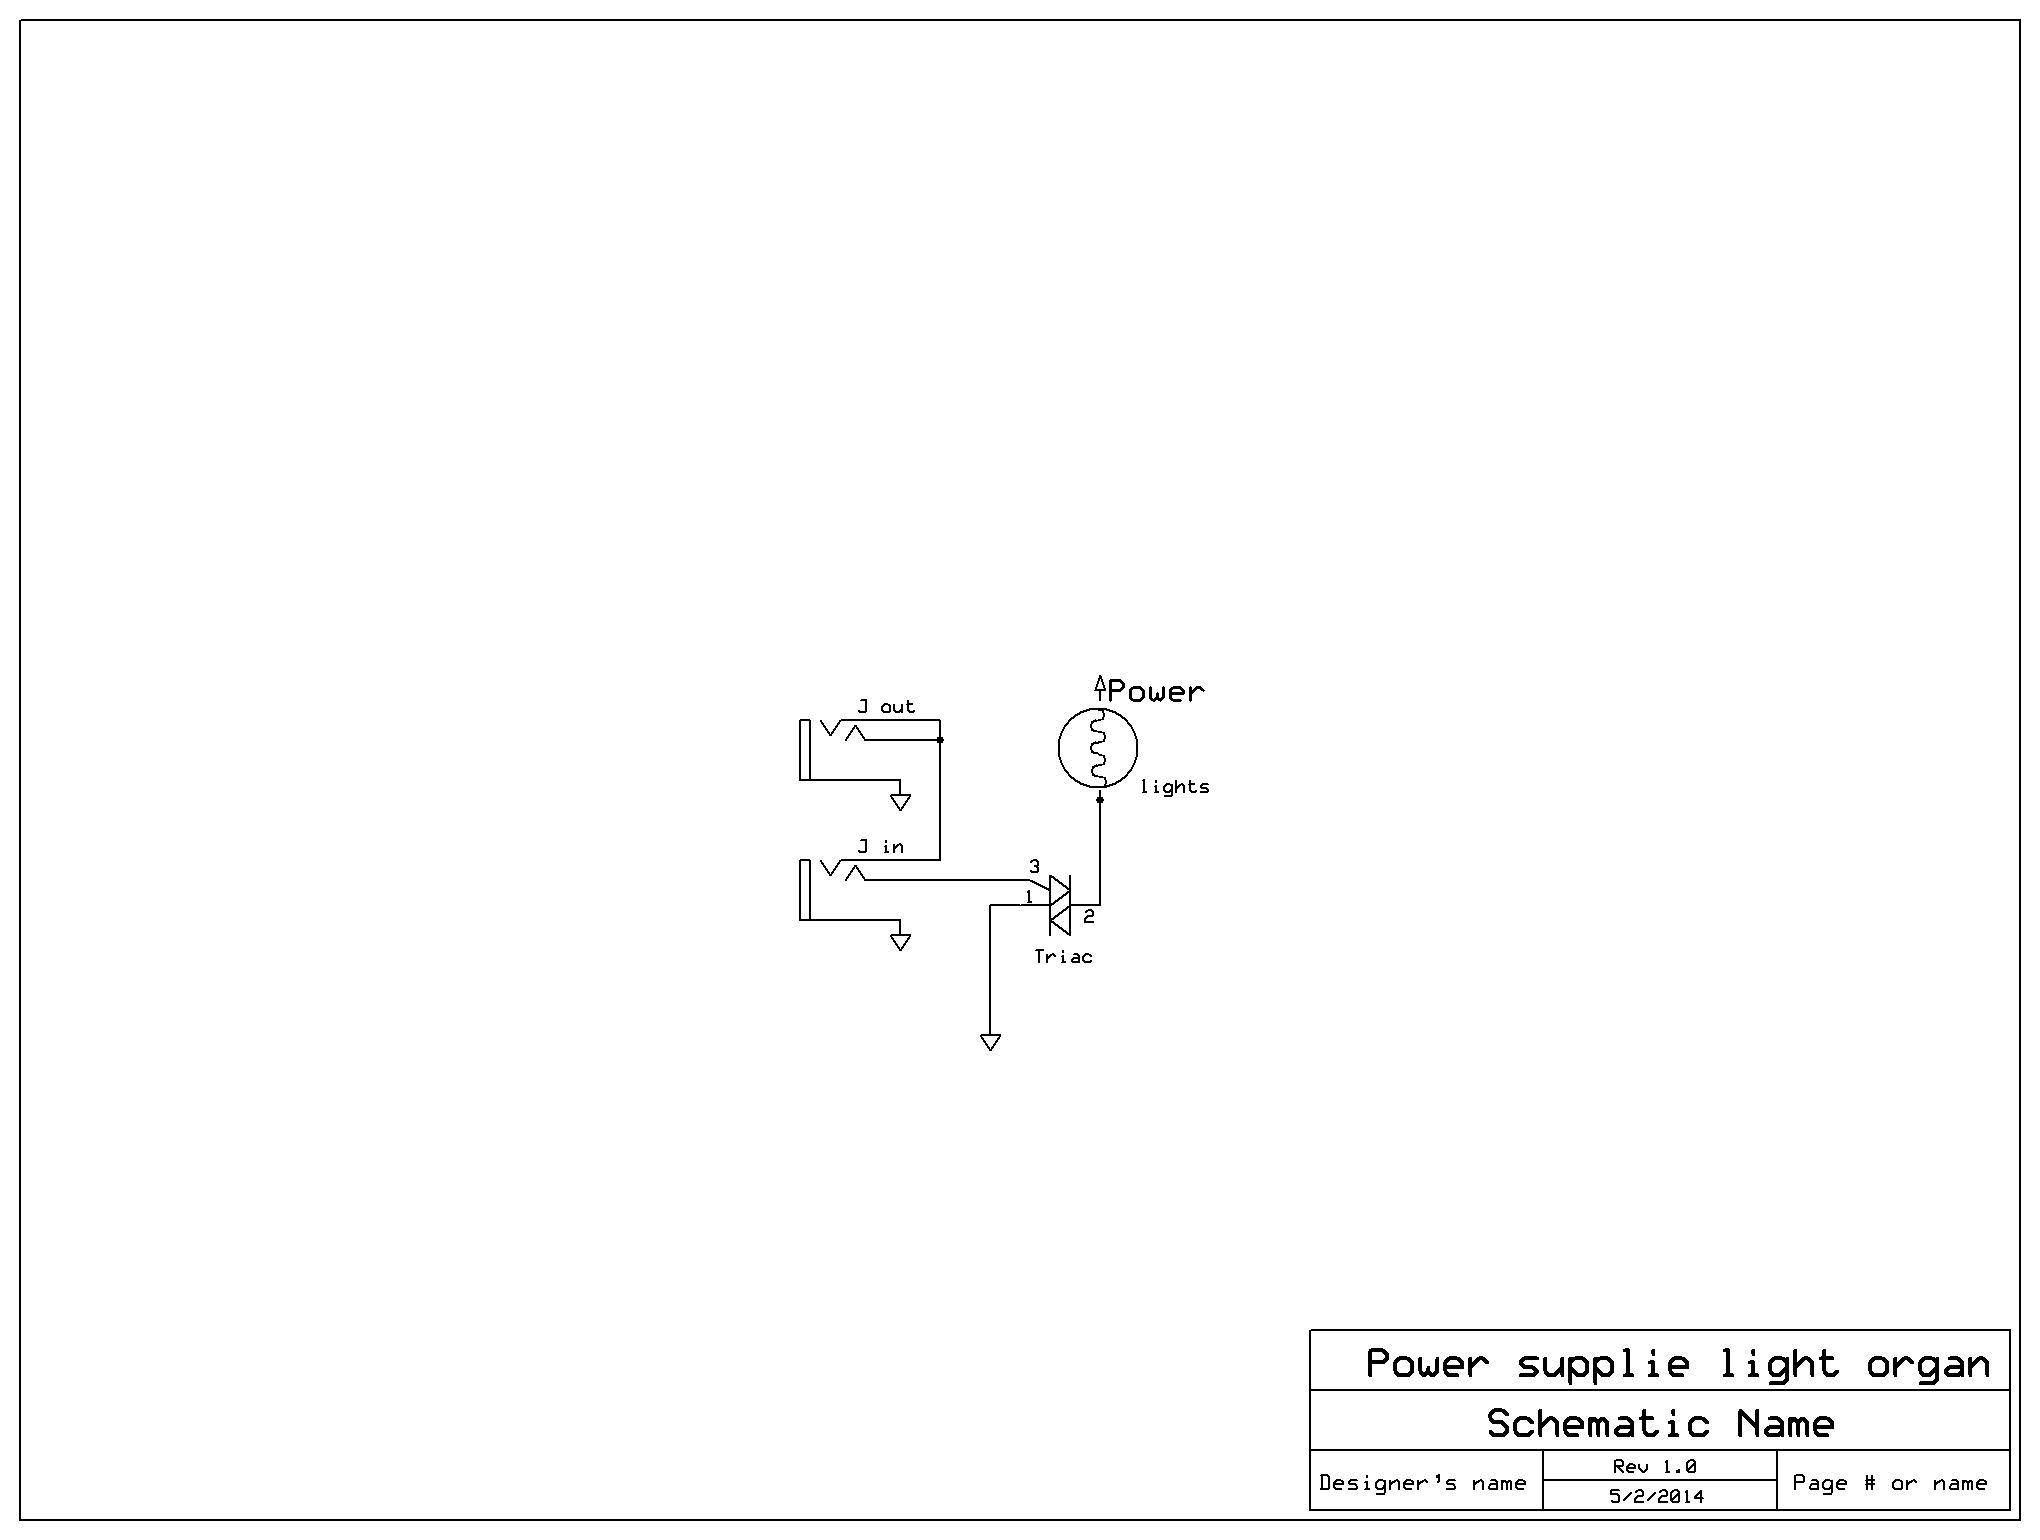 Light Organ Schematic Trusted Wiring Diagrams Coloursoundorgan Electronic Circuit Diagram Crtc Electronics Power Strip 12 Volt Led Lamp